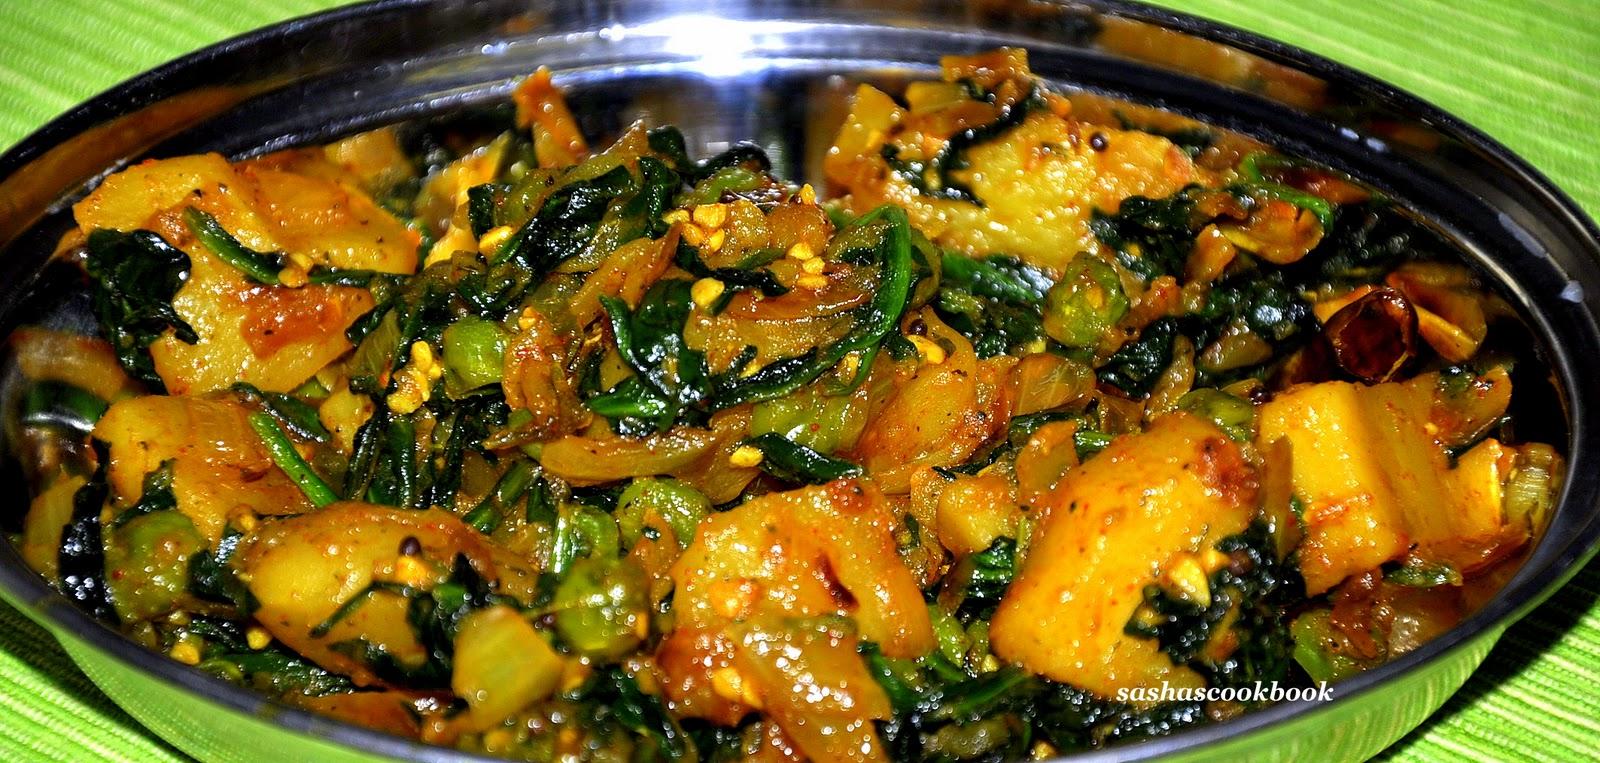 Sasha's Cookbook: Aloo Palak / Potato with Spinach